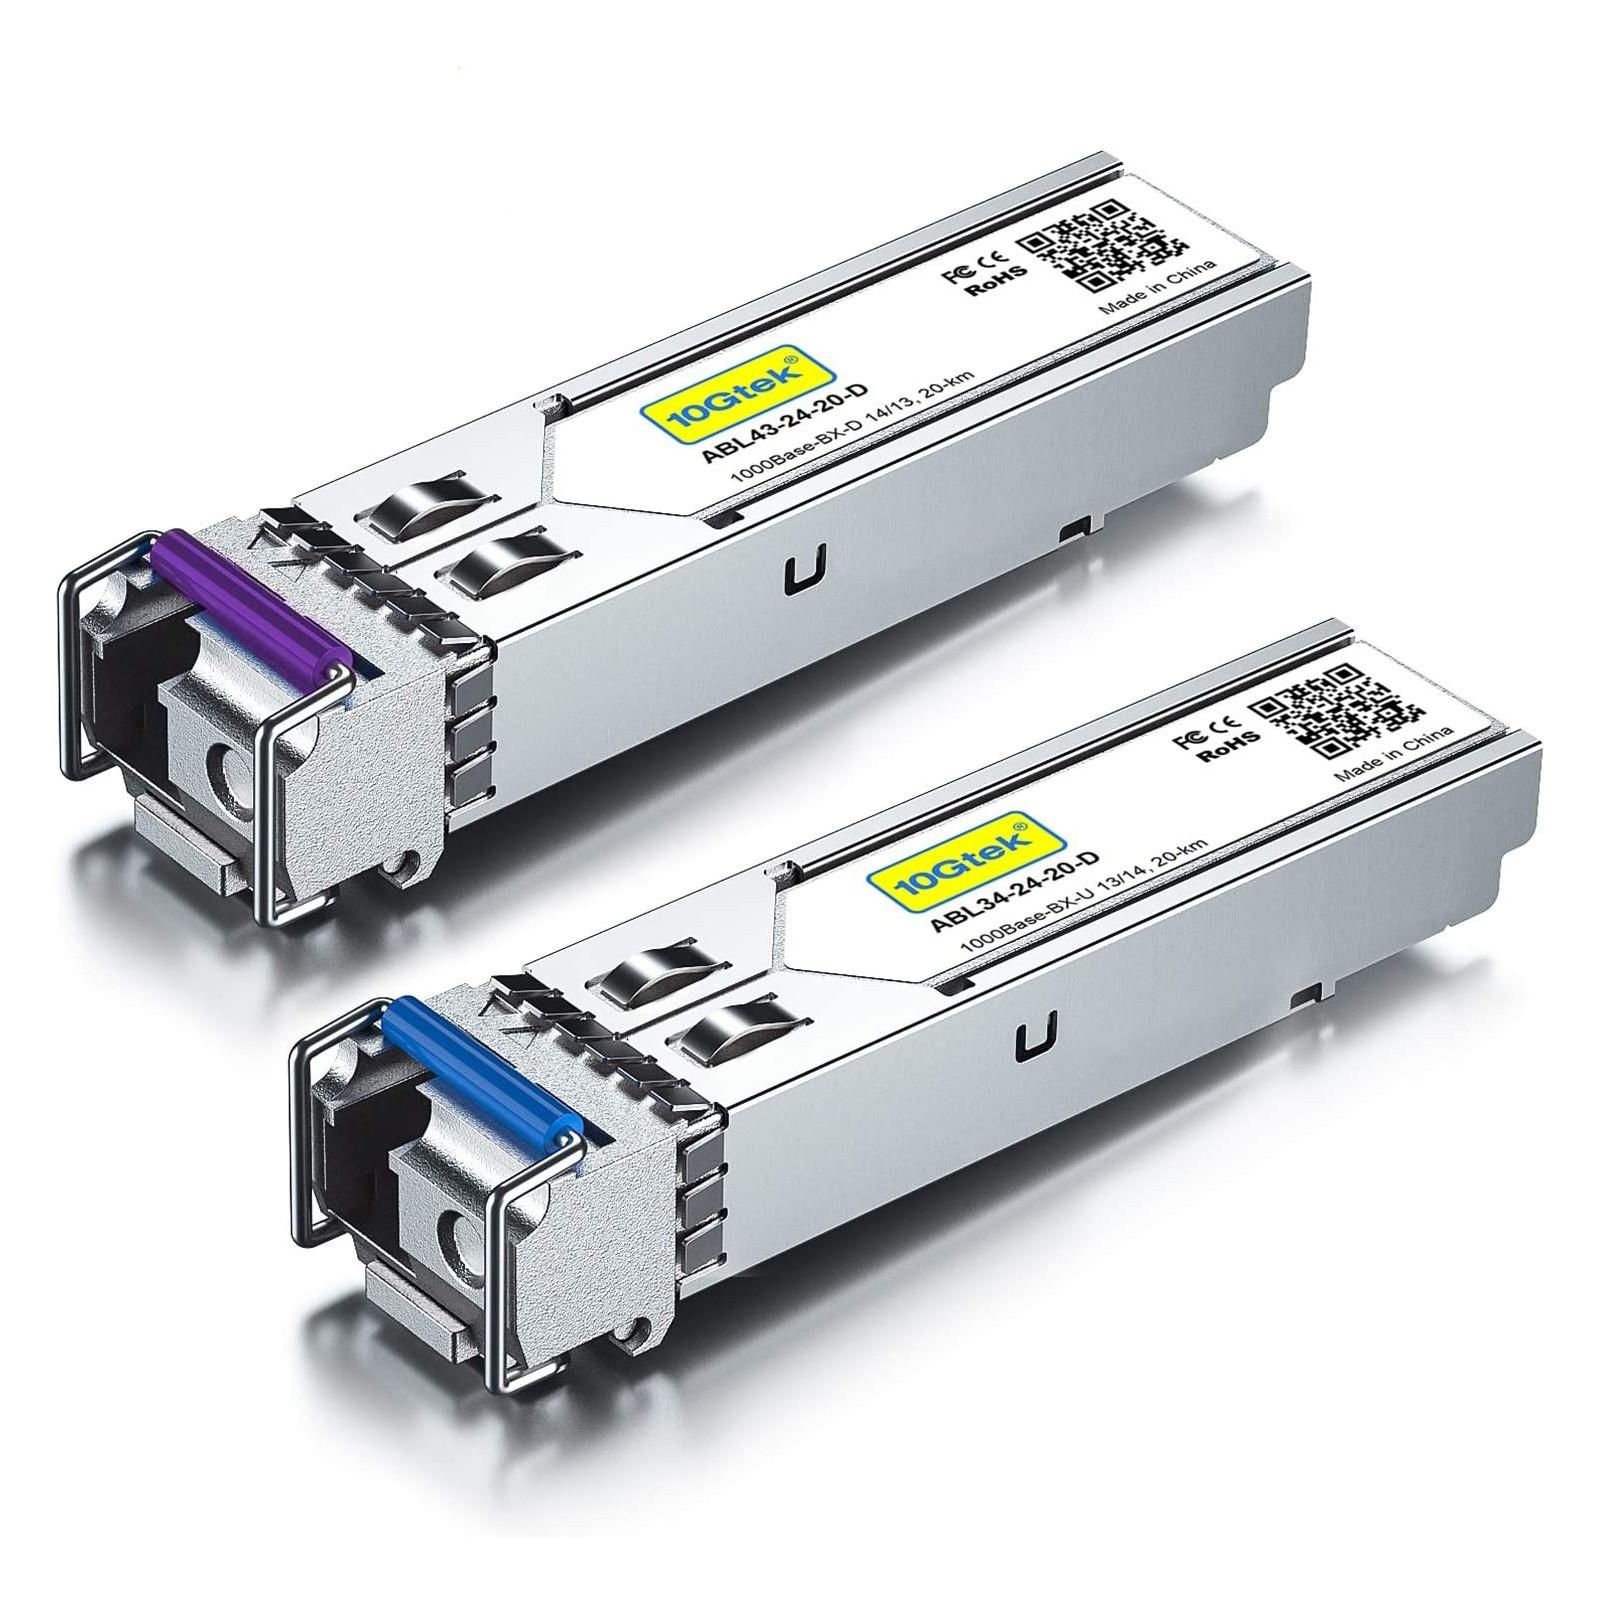 A Pair of 1.25G SFP Bidi Transceiver, 20km Compatible for Mellanox